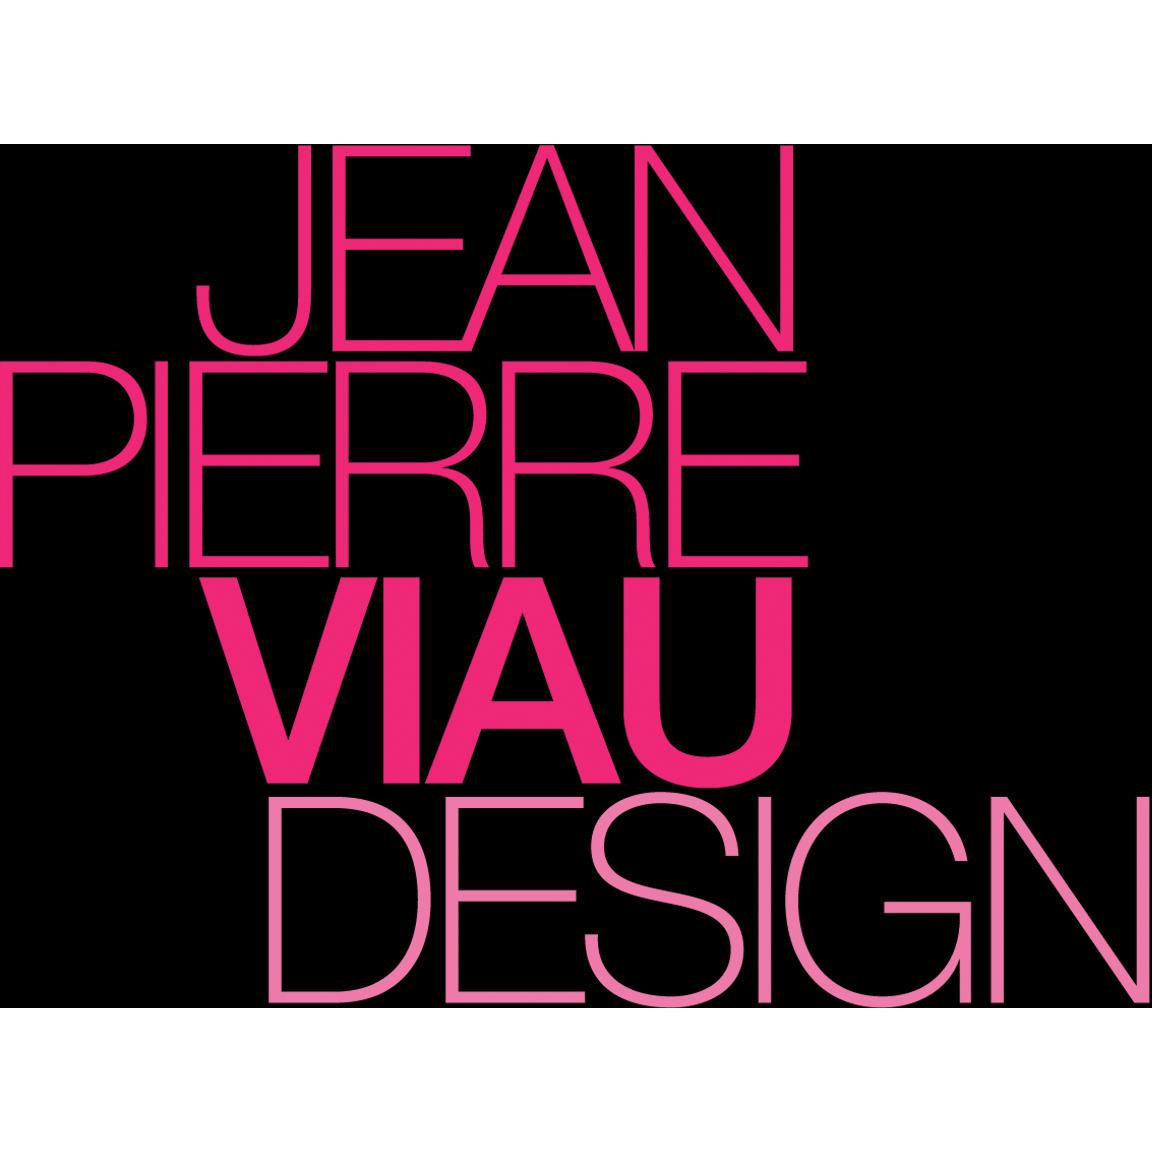 Jean-Pierre Viau Design